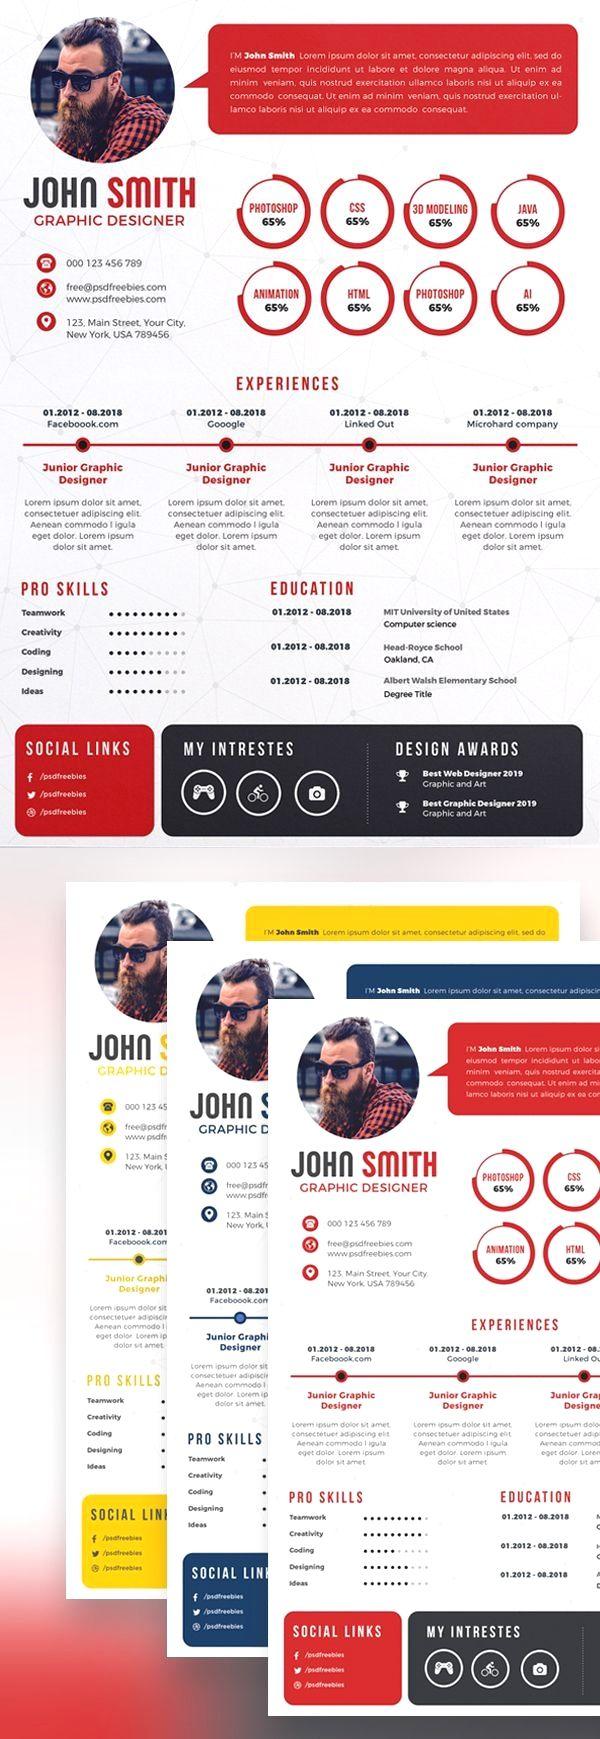 Pin by Fleta Mountain Resume Tips on Resume Design